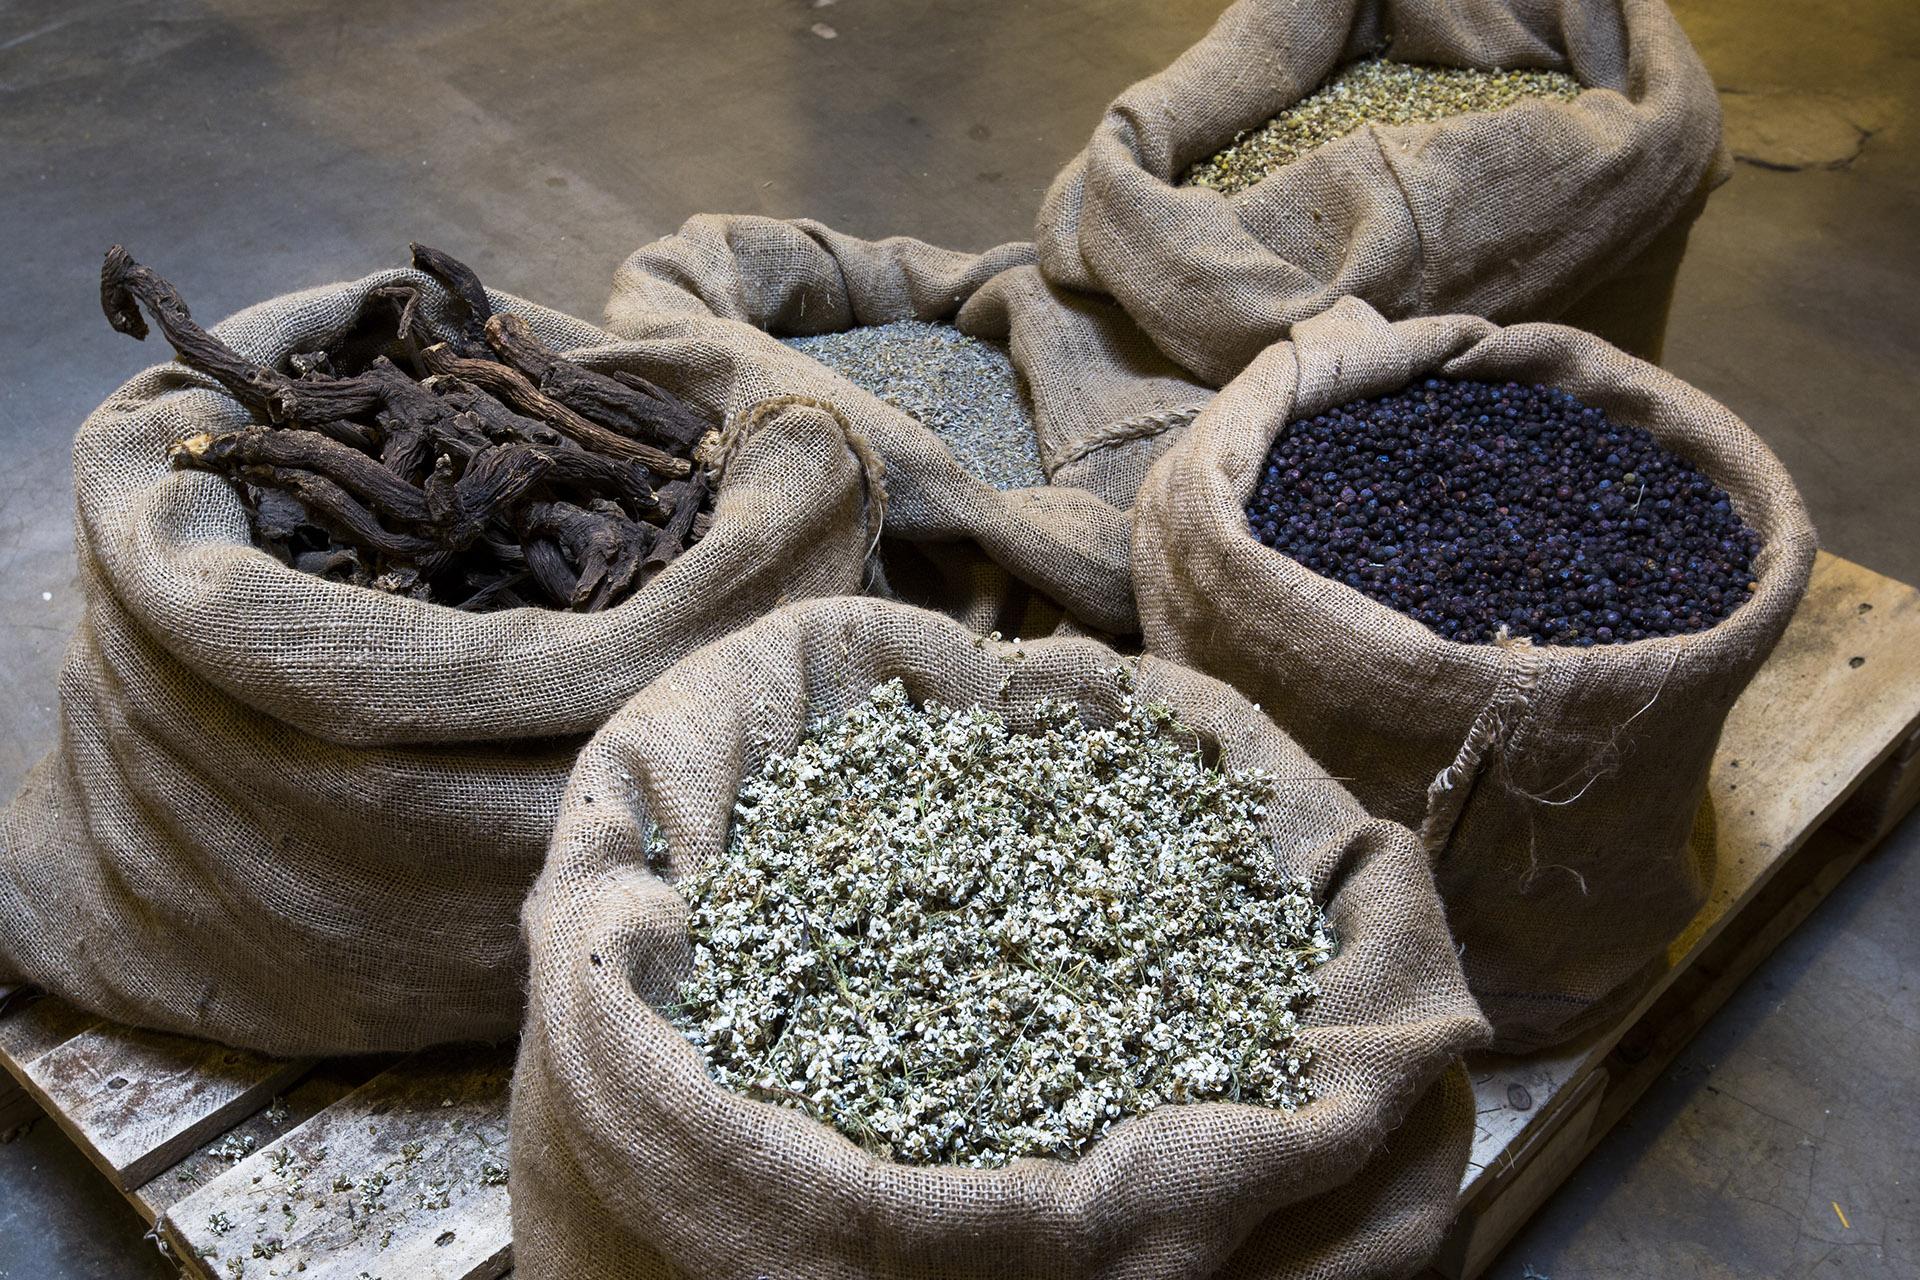 Herbs for making liquor Amaro Braulio, Italy